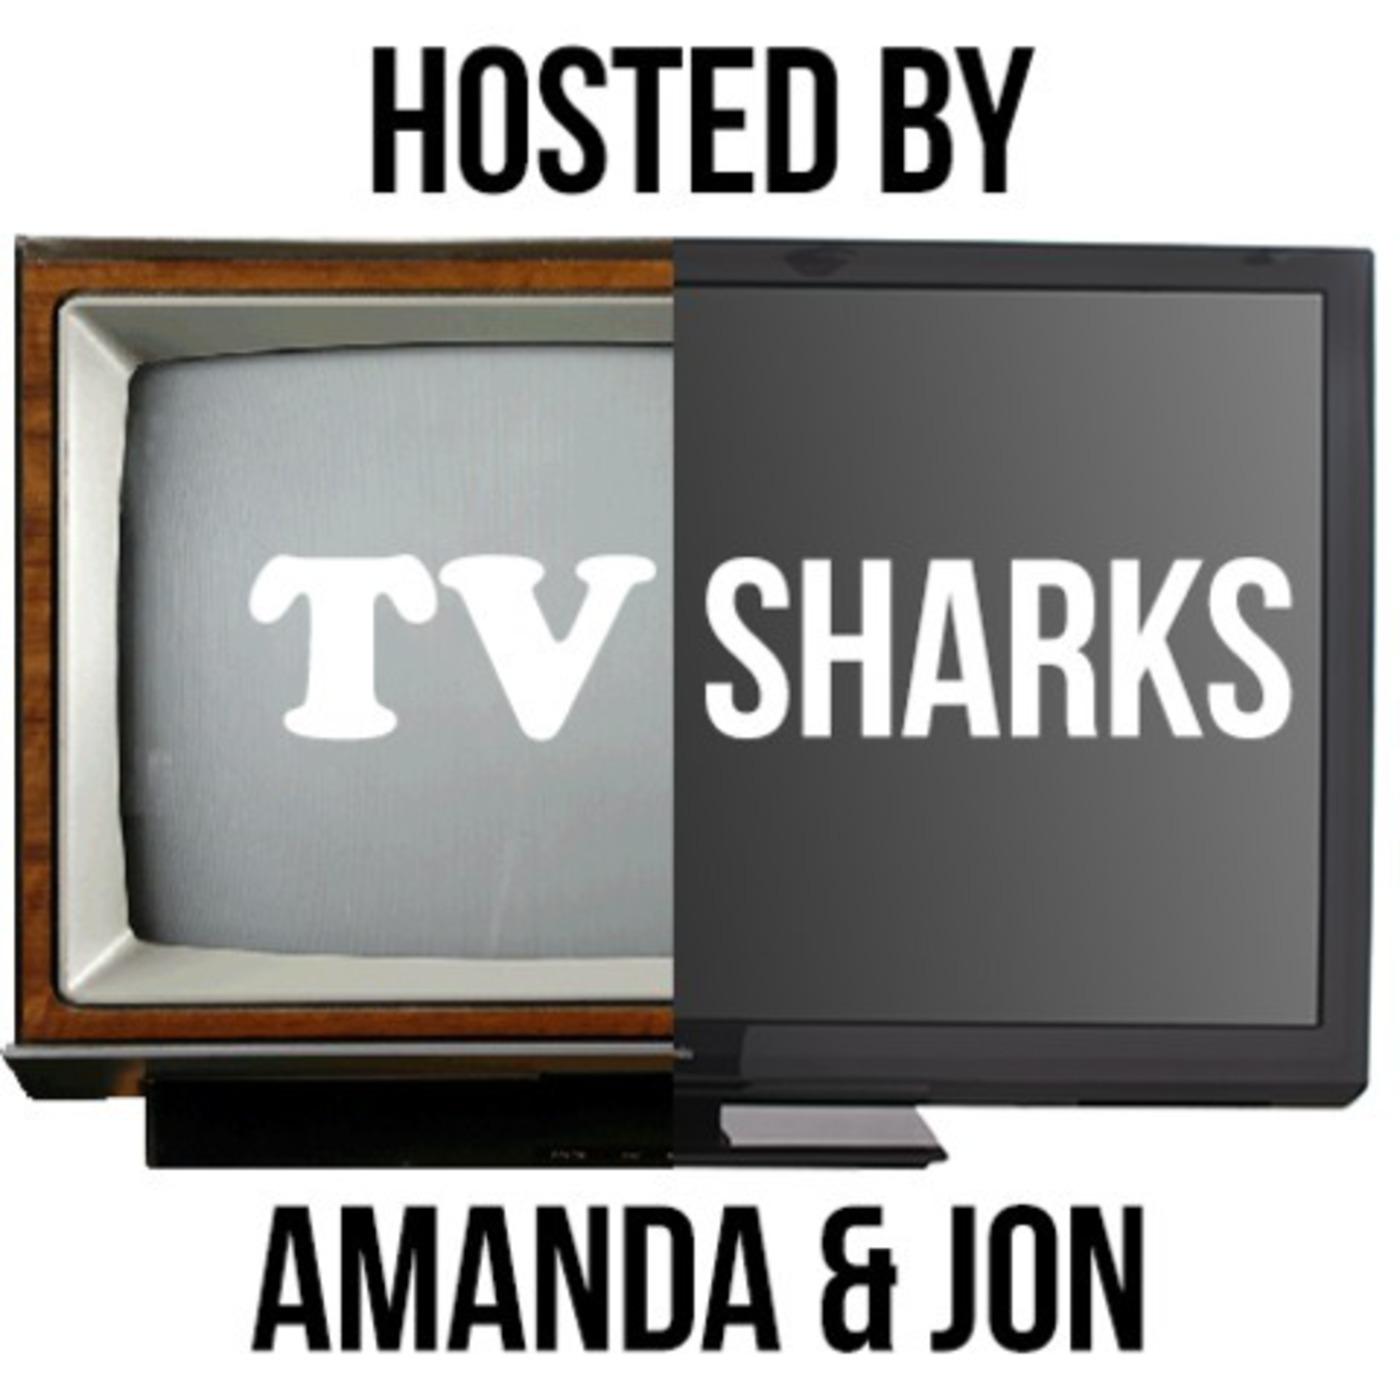 TV Sharks